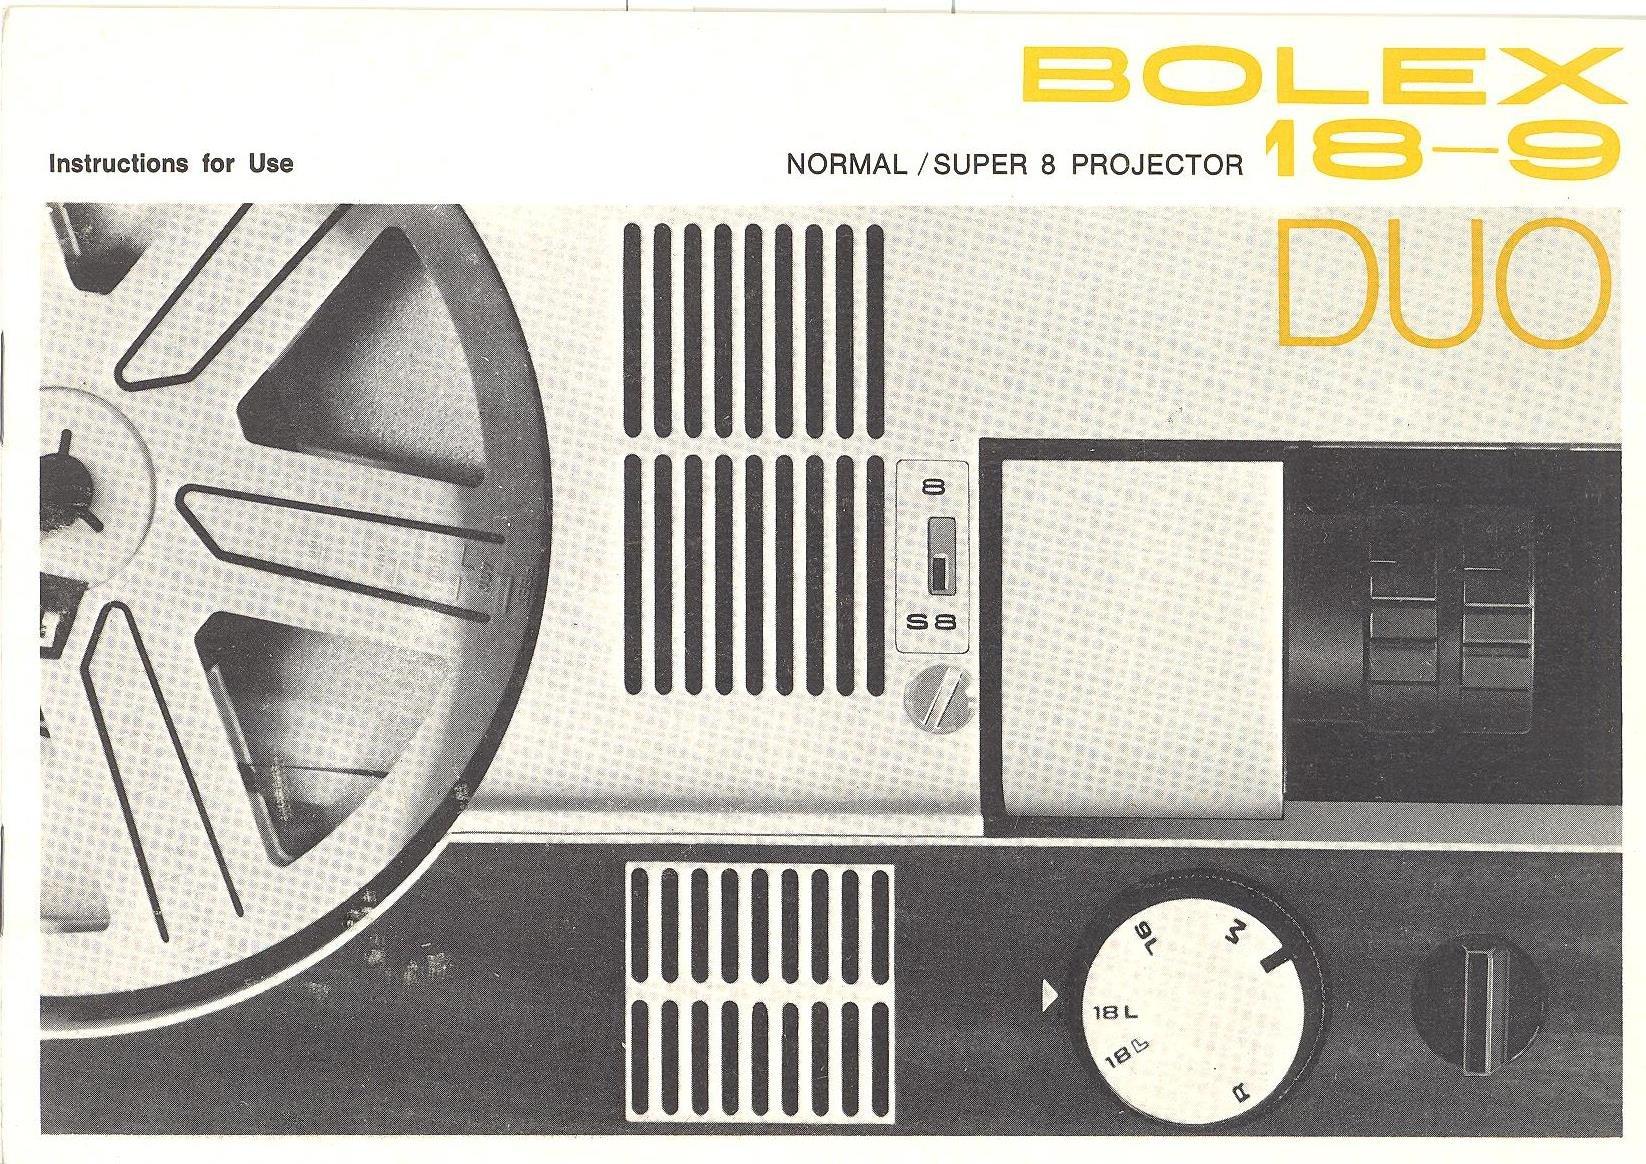 Bolex 18-9 Duo Normal/Super 8 Movie Projector Original Instruction Manual:  Bolex: Amazon.com: Books